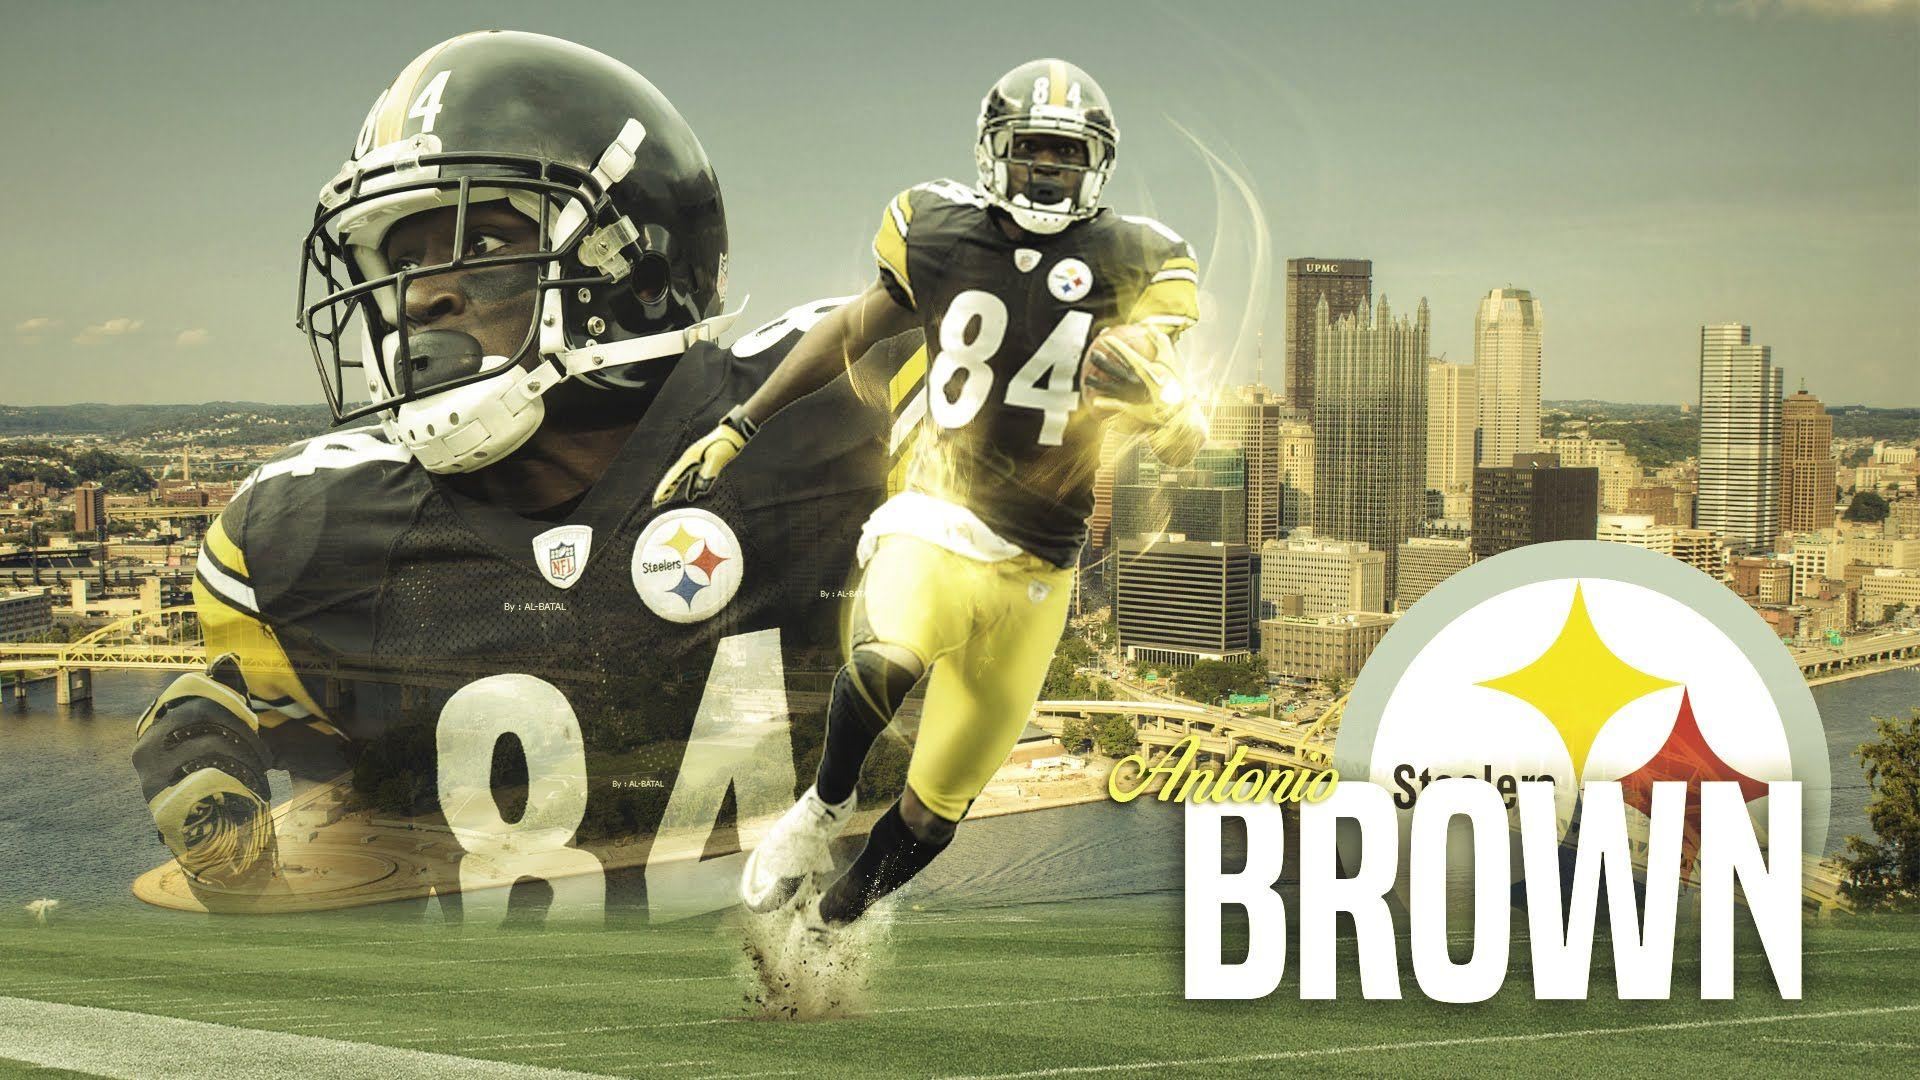 Pittsburgh Steelers Wallpaper HD - wallpaper.wiki